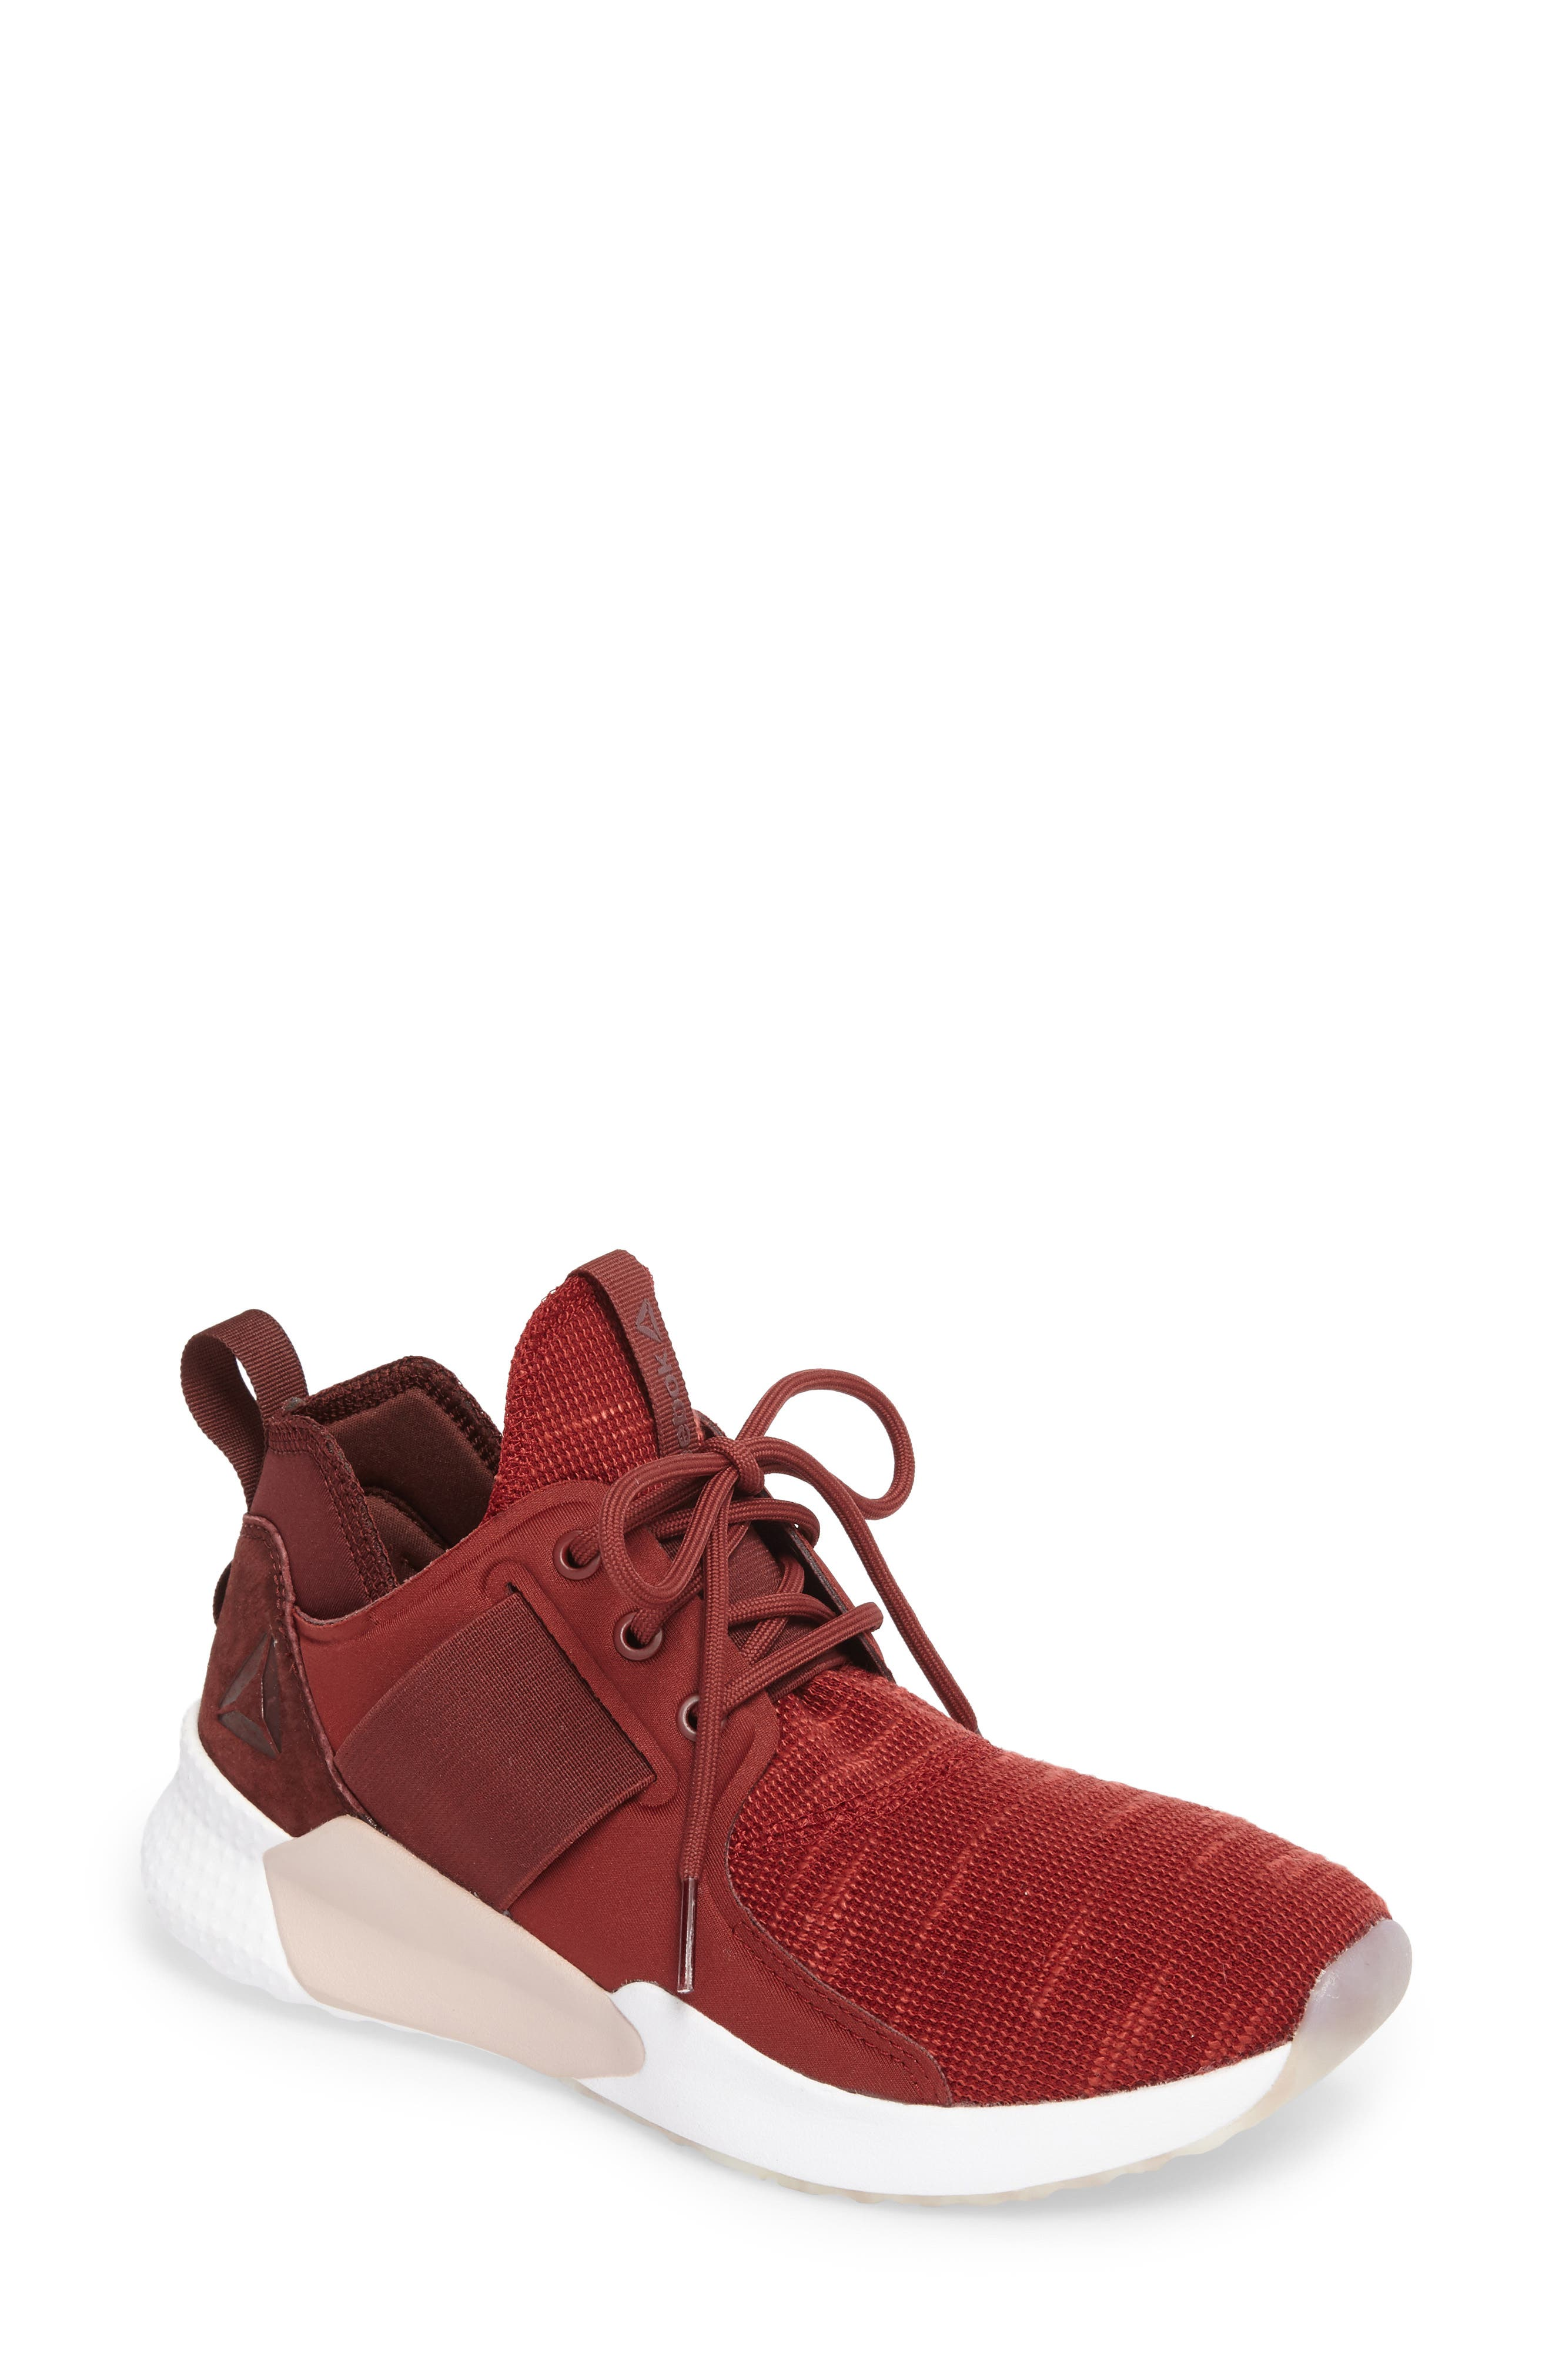 Alternate Image 1 Selected - Reebok Gureso 1.0 Training Shoe (Women)